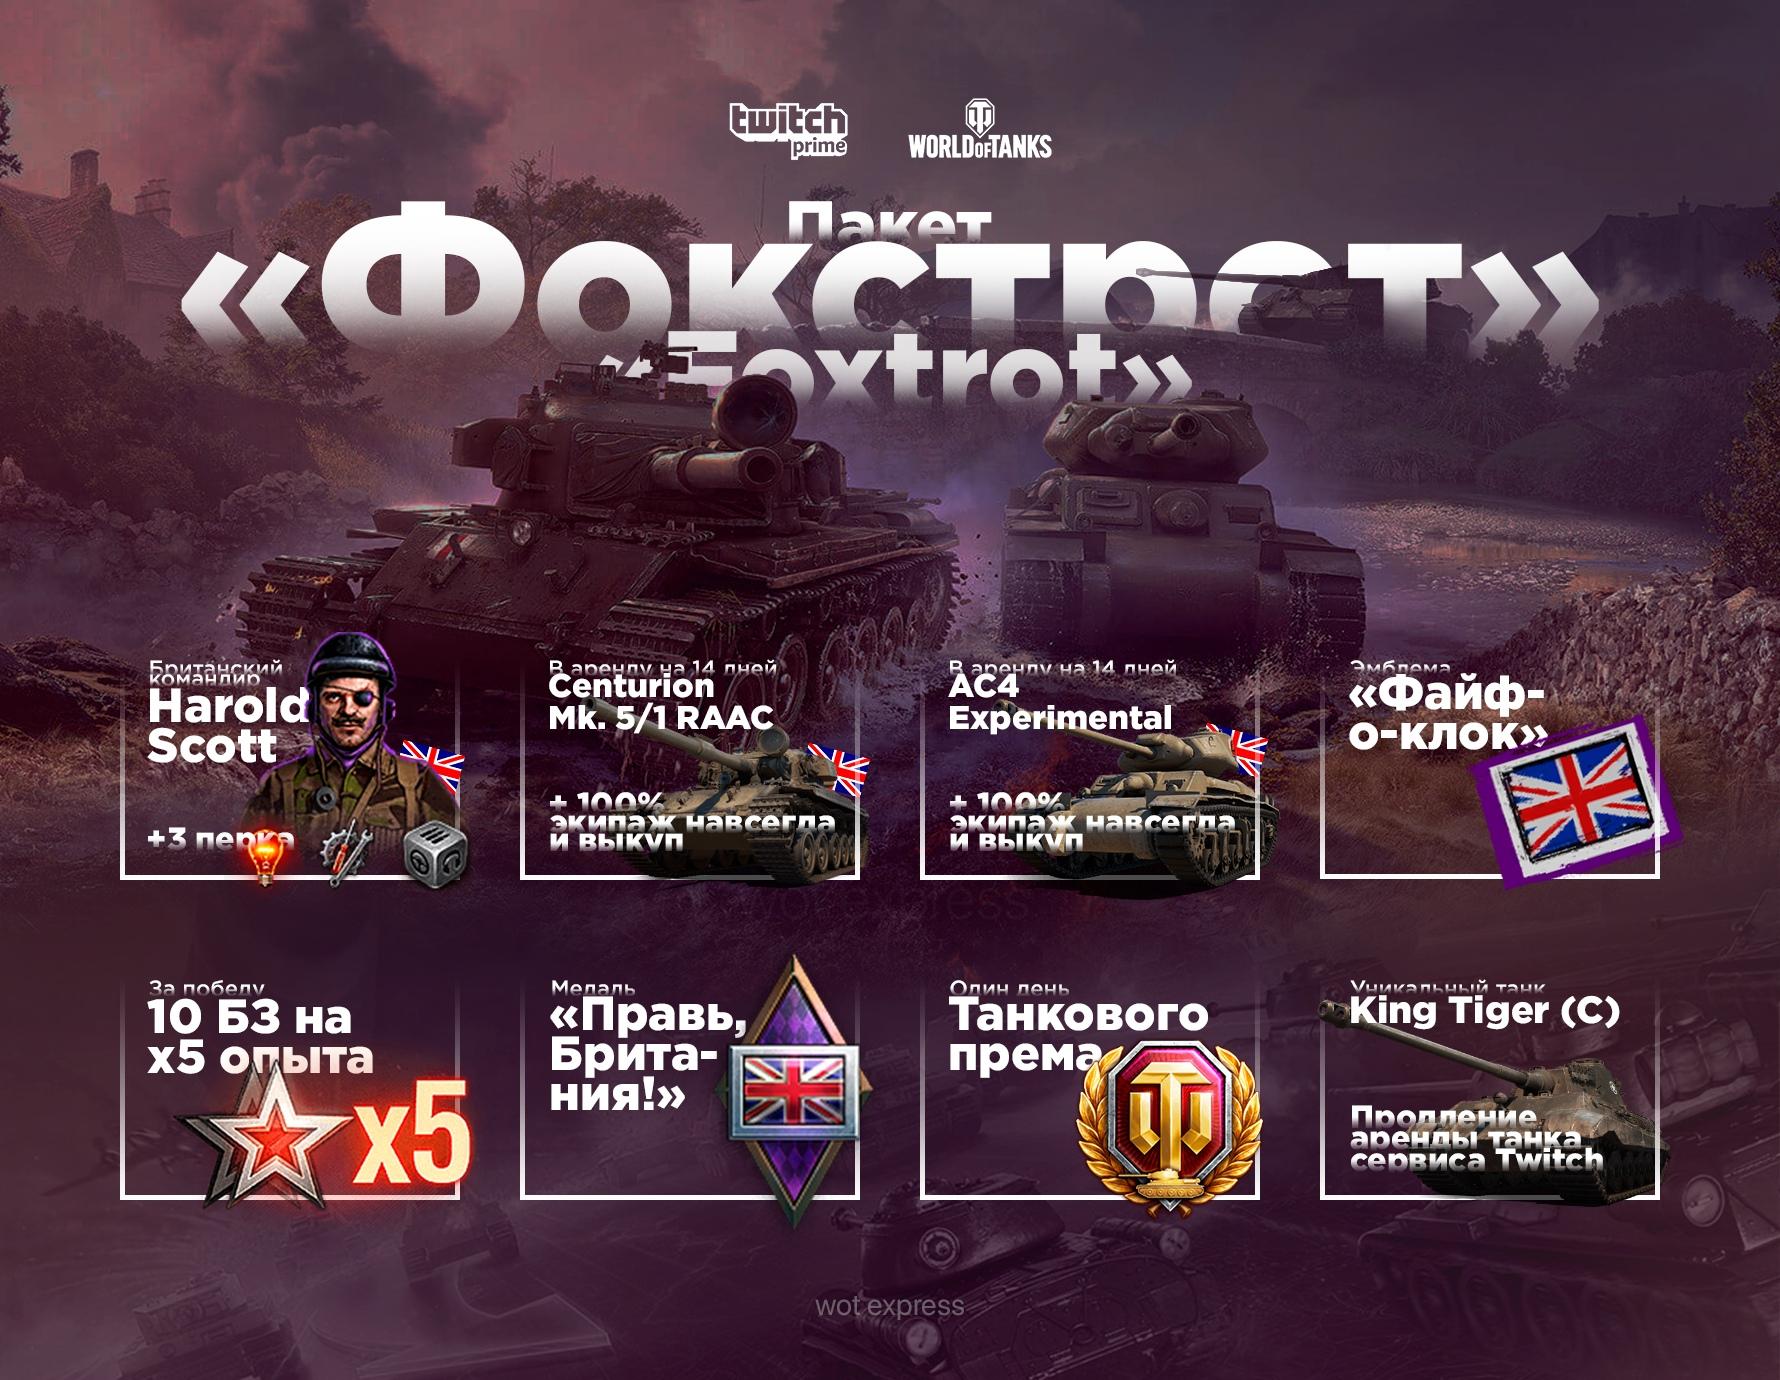 регистрация world of tanks с бонусом 2017